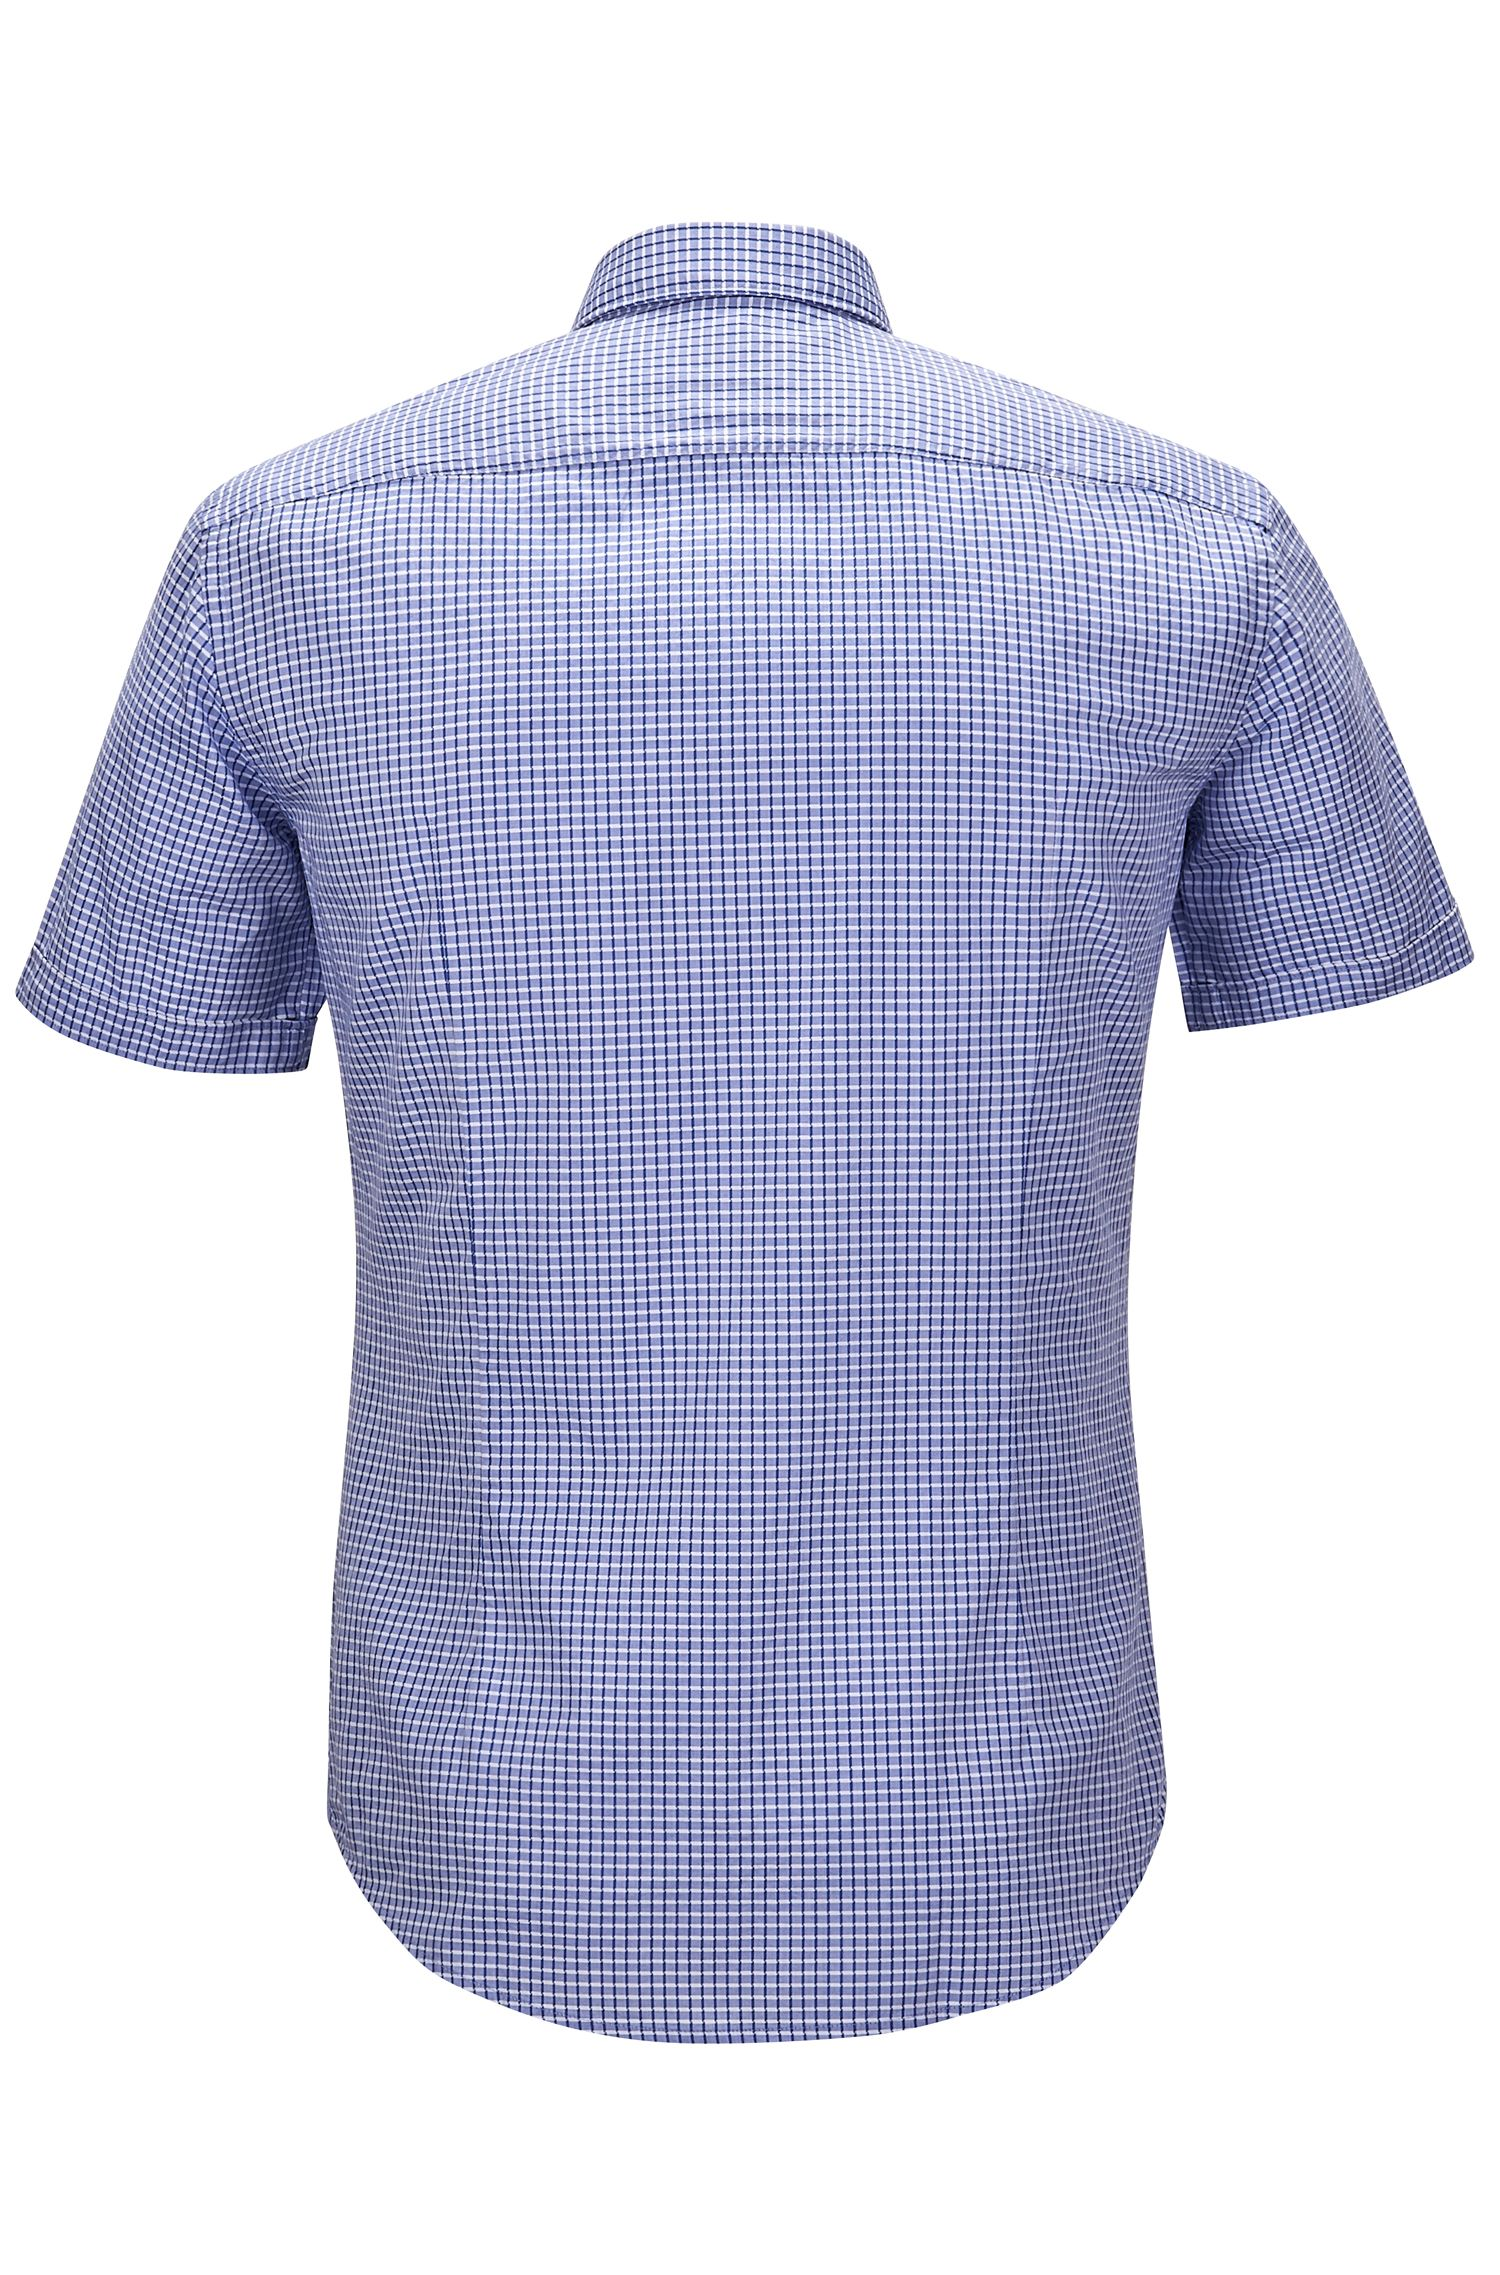 Cotton Blend Button-Down Shirt, Slim Fit | Ronn